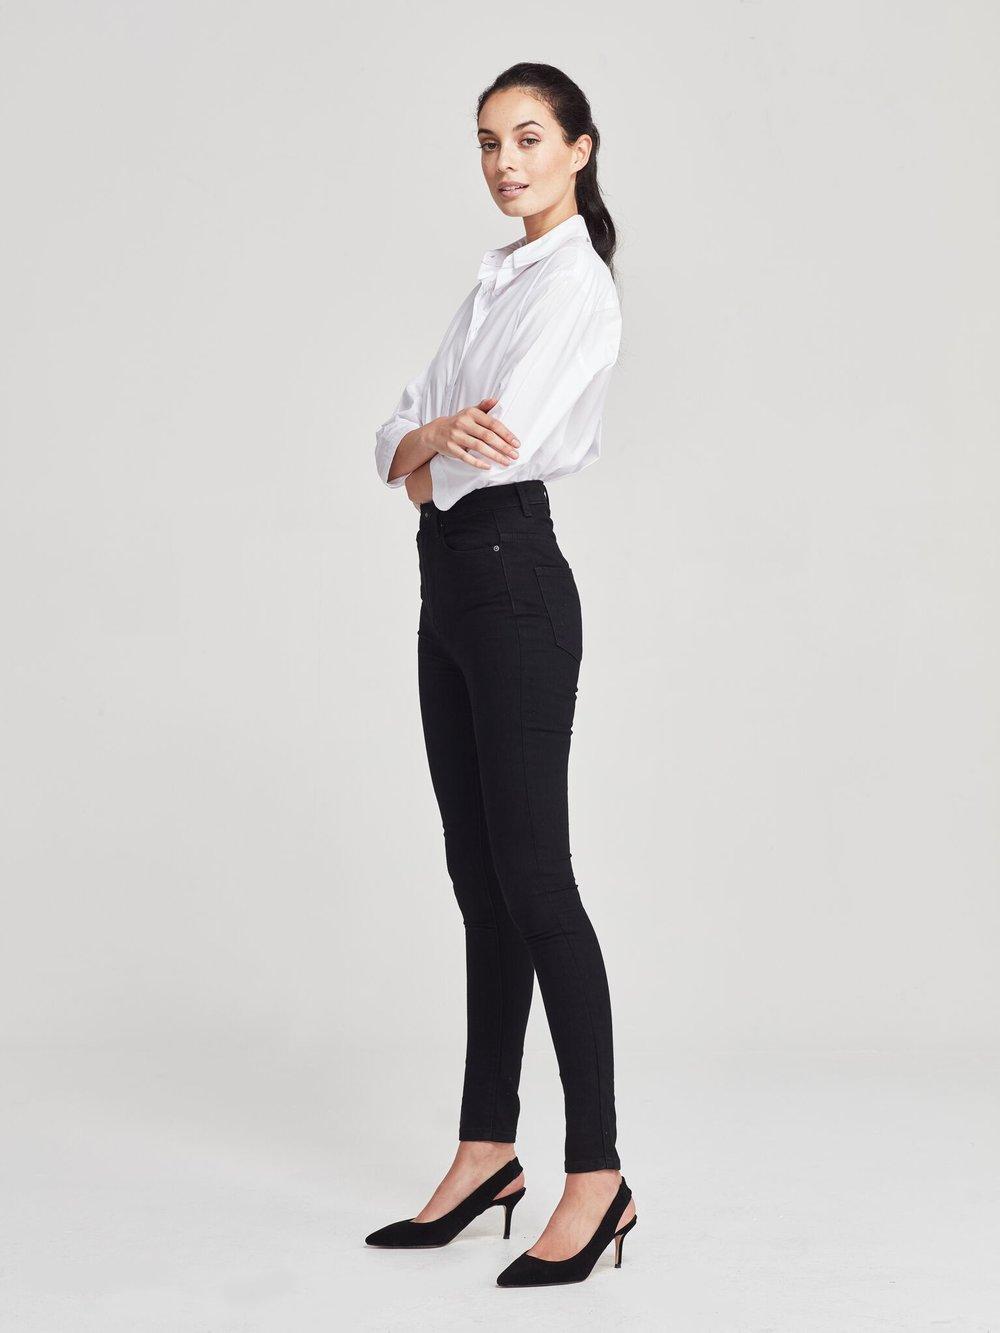 JH Denim  high waist skinny jean (denim) black rinse on model